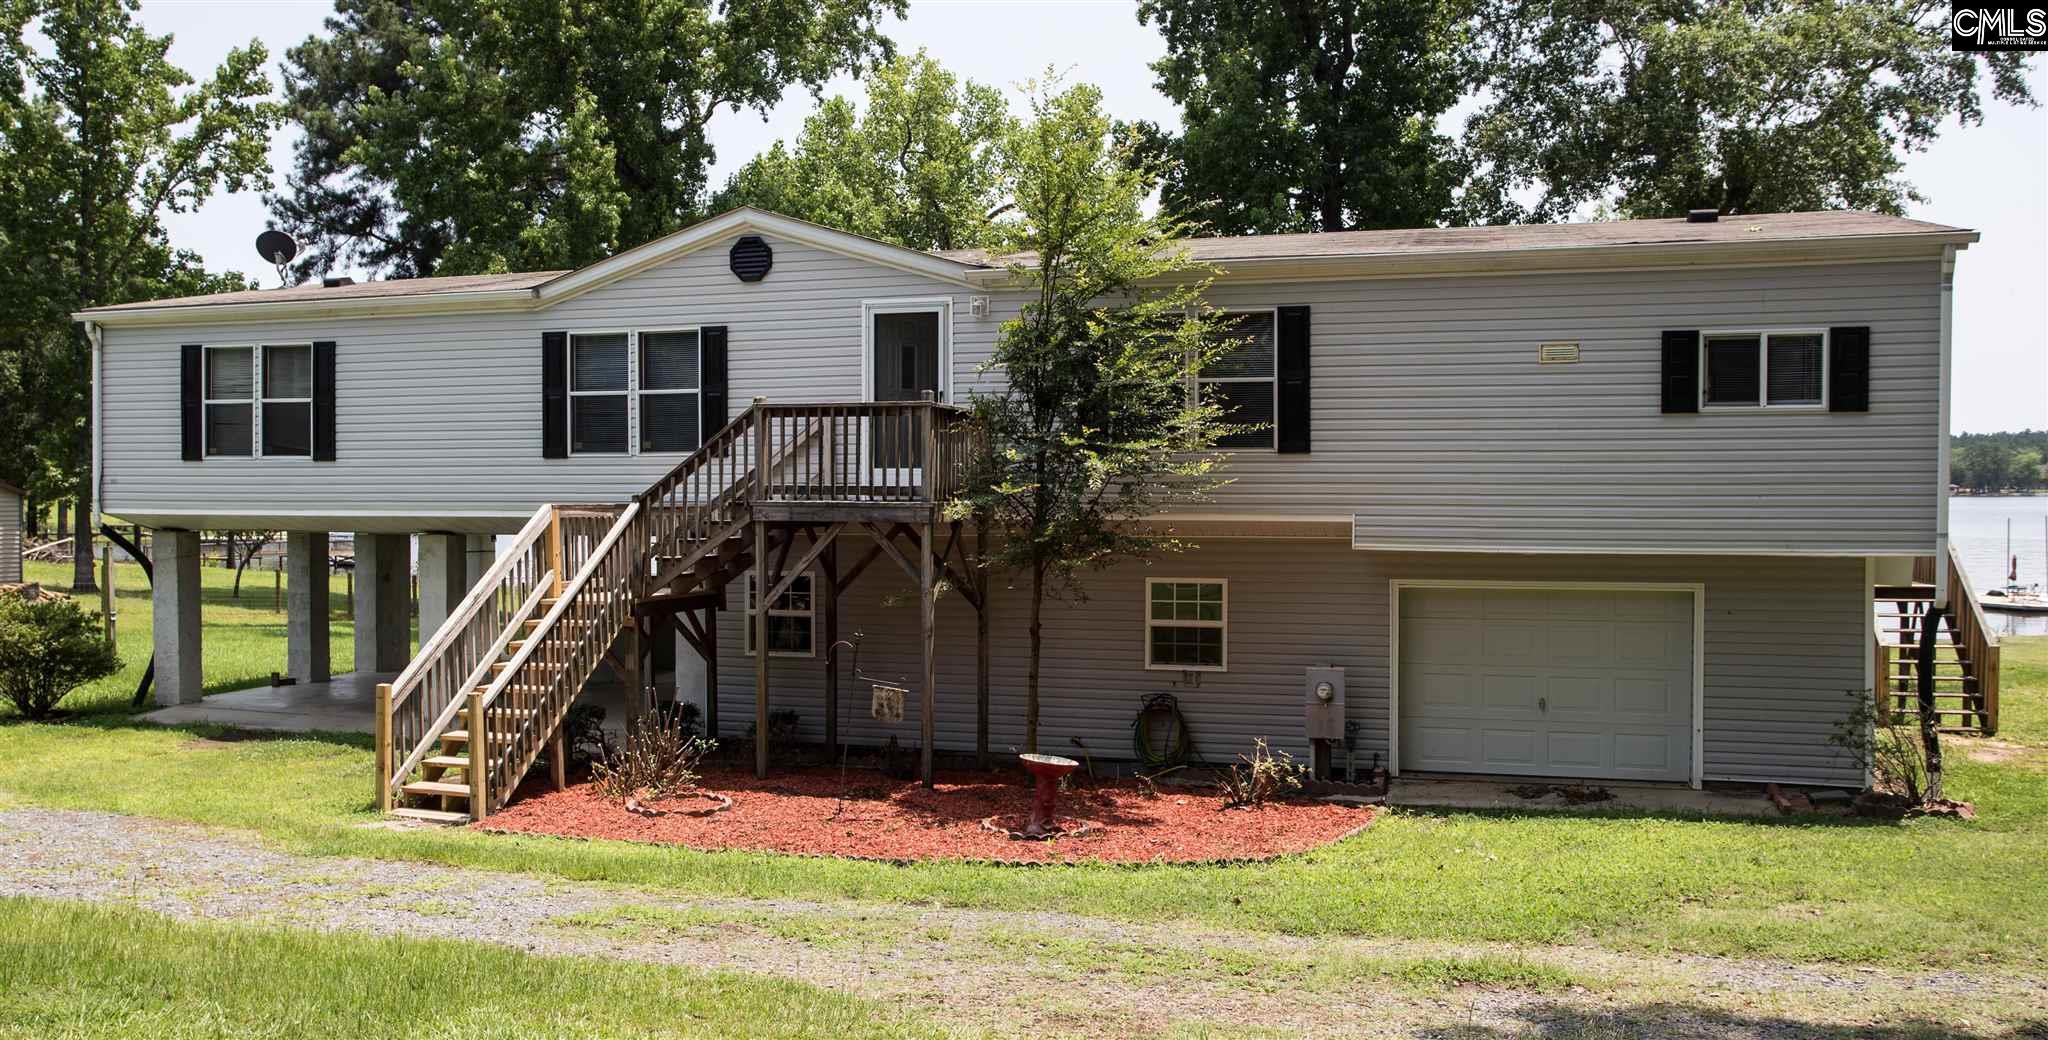 325 Dutchman Lane Winnsboro, SC 29180